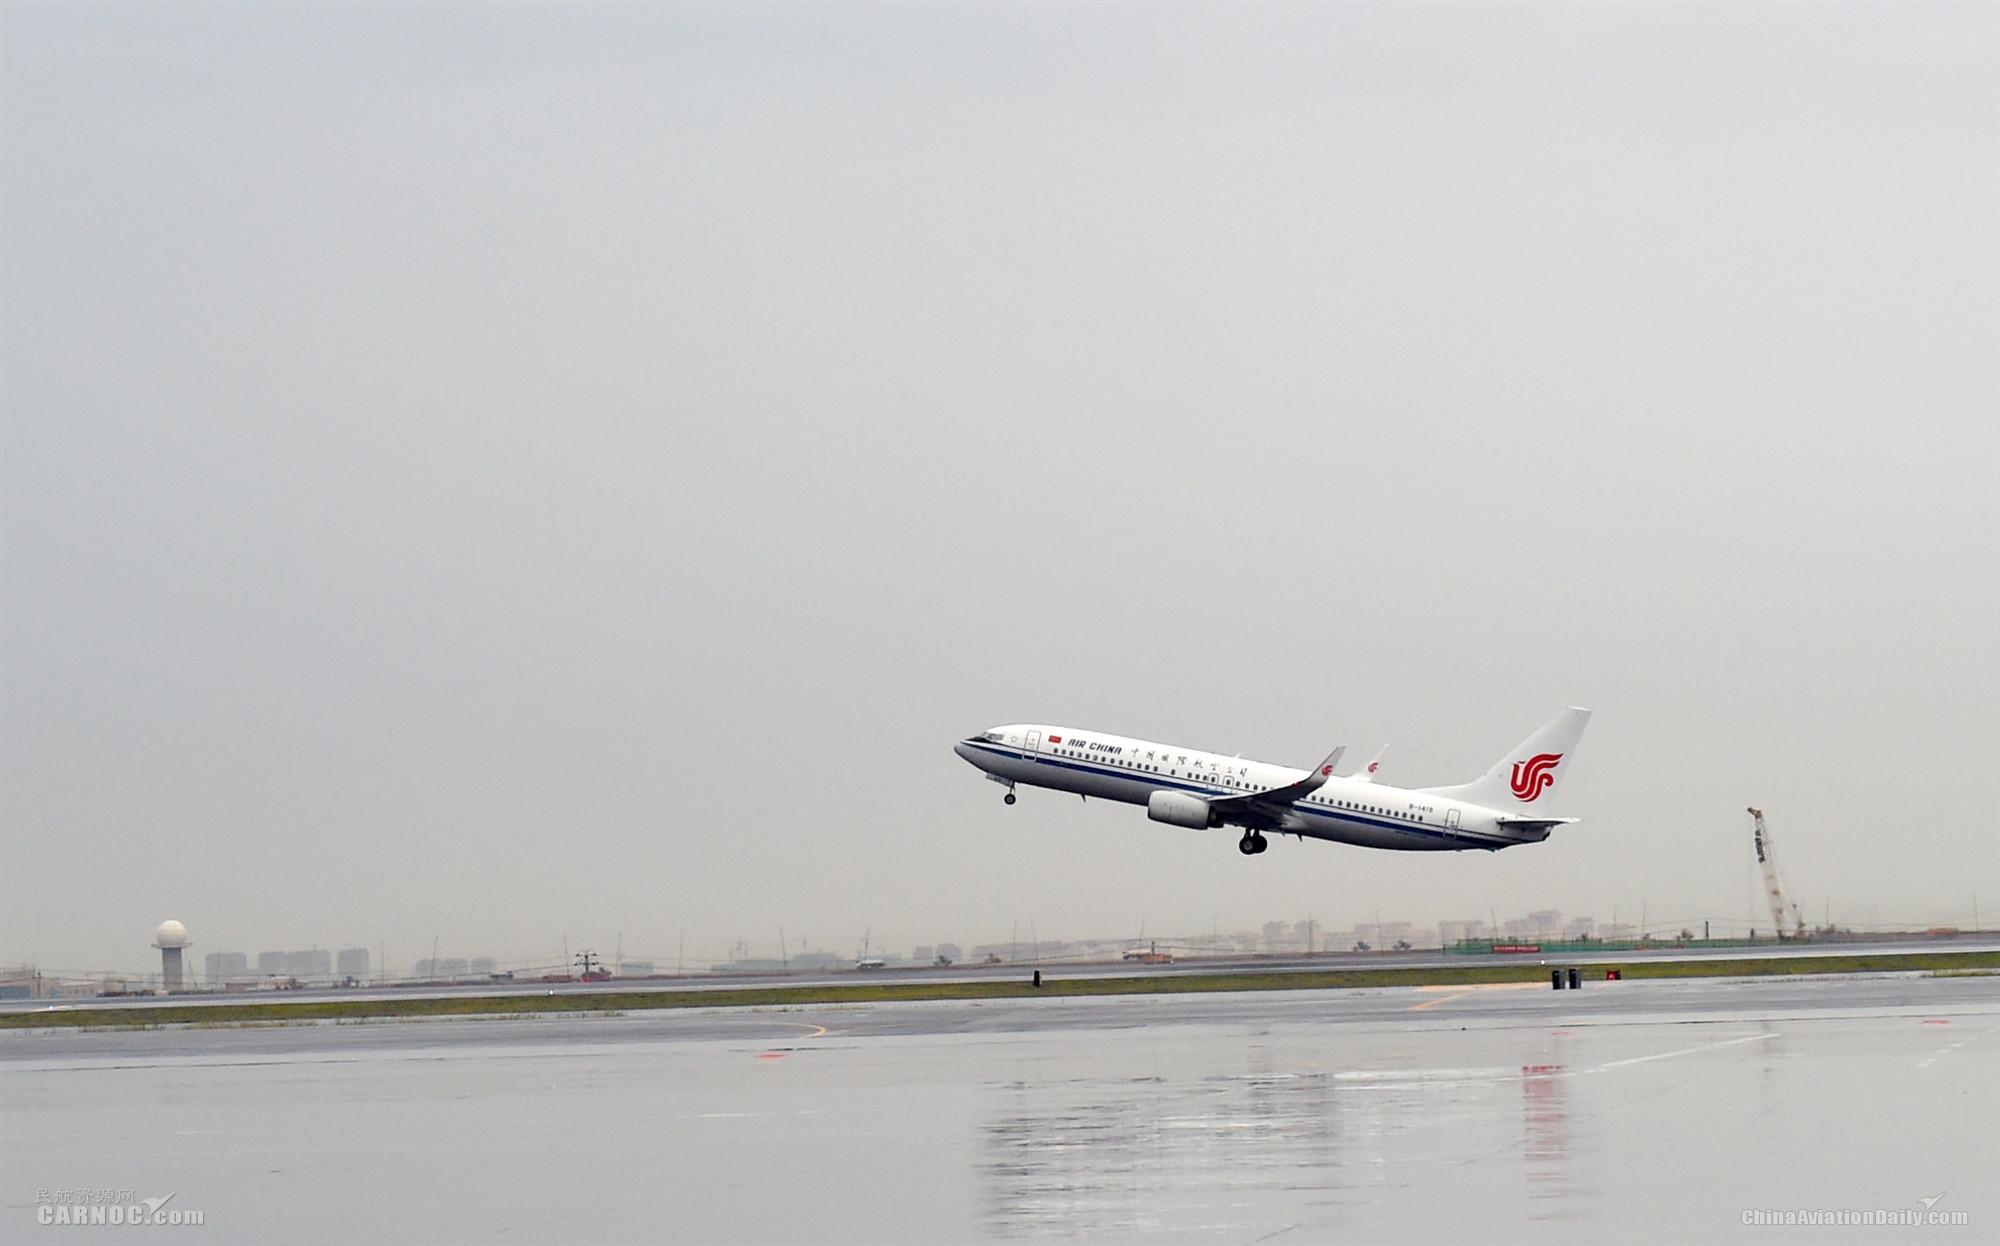 CA1478航班作为国航新疆分公司首航航班飞往北京,国航新疆分公司正式开展航线运营。尹璐摄